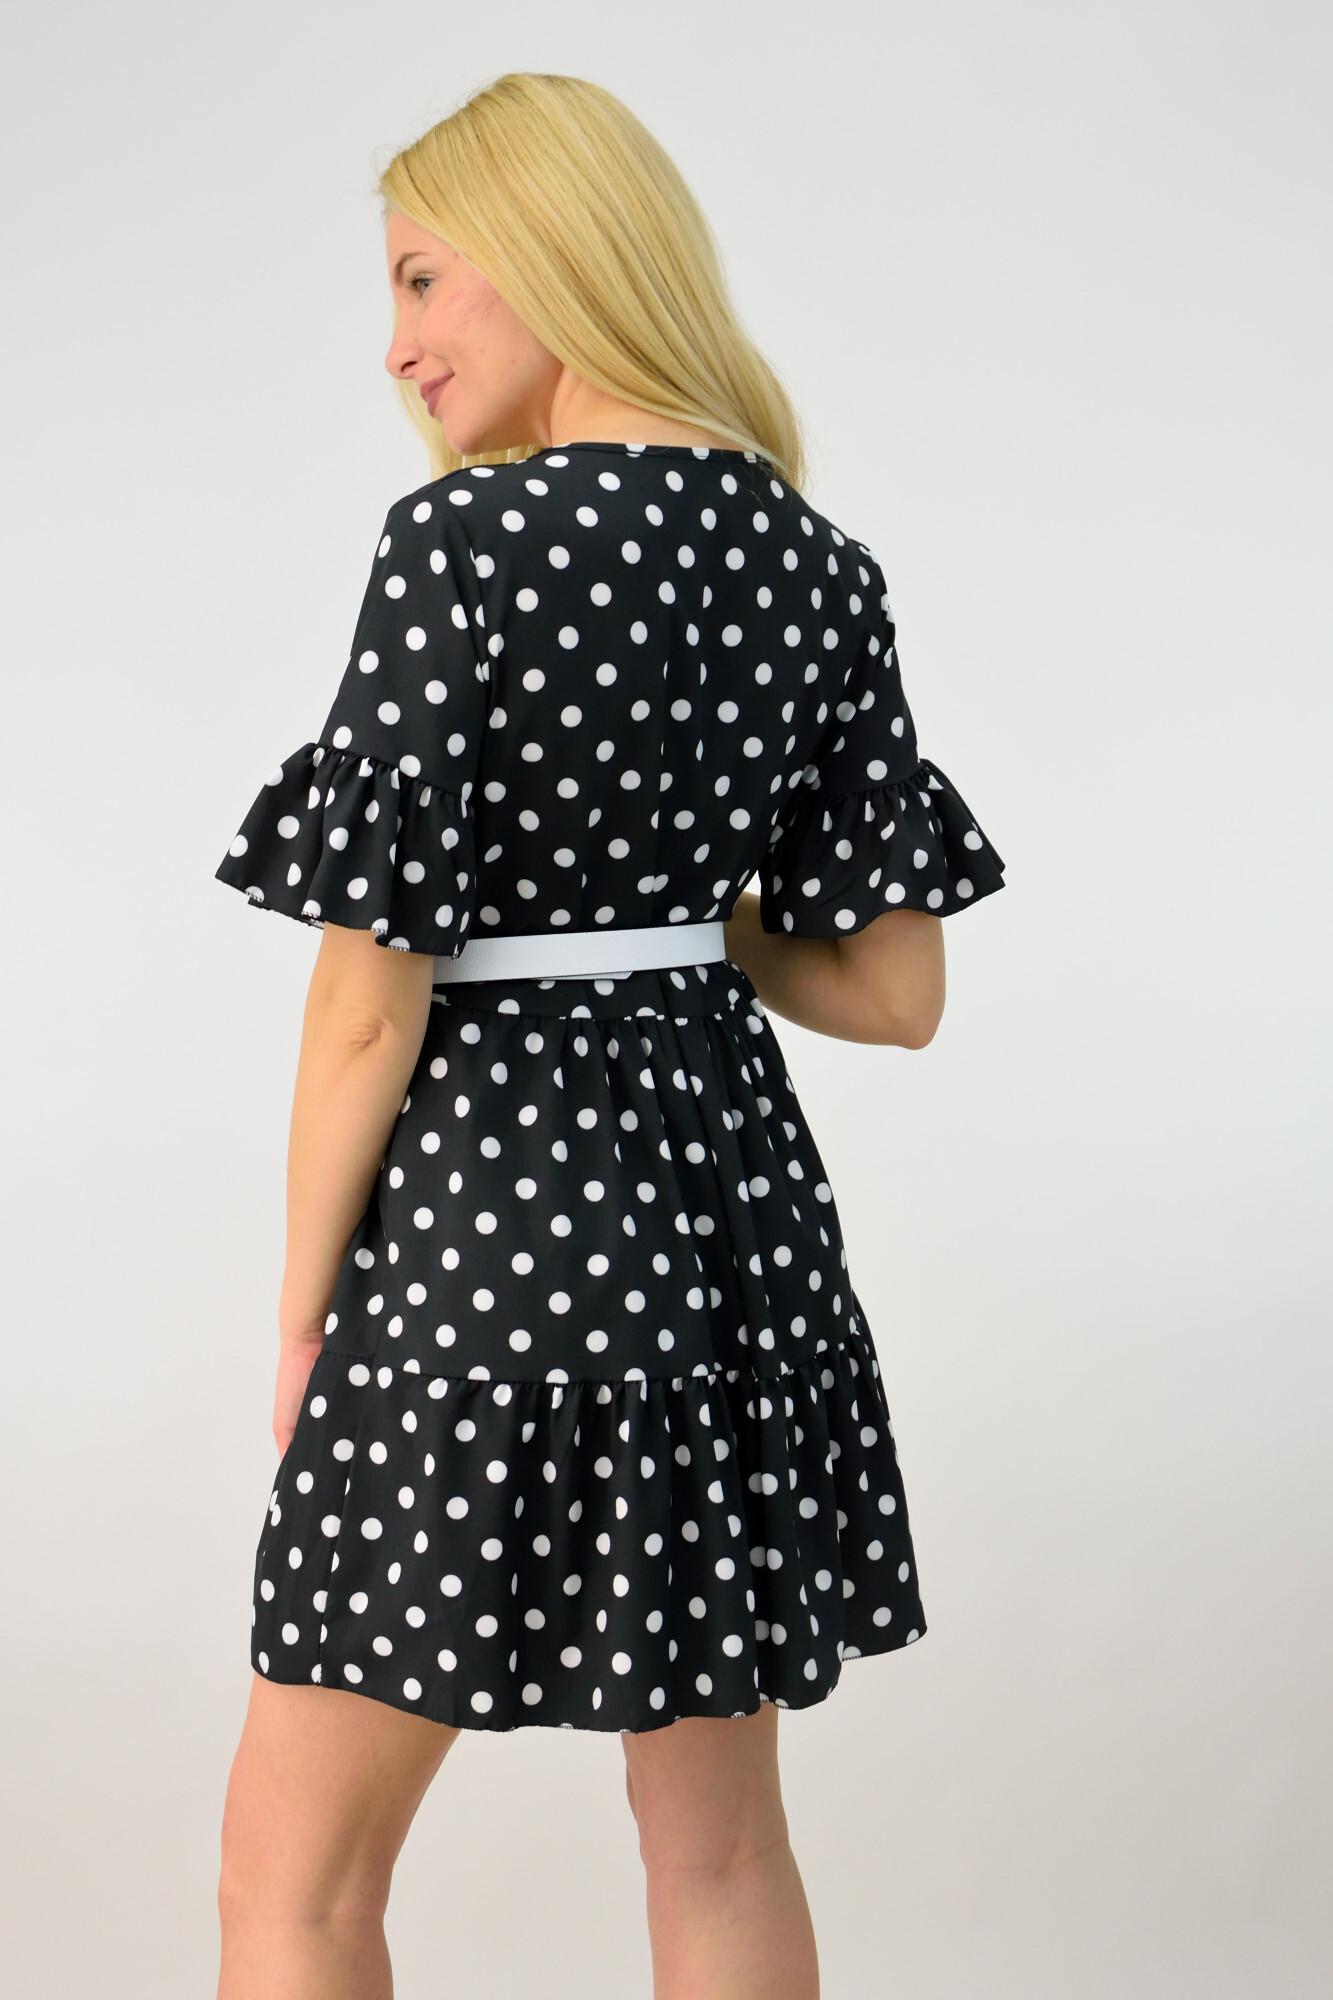 2ce0b3780c96 Γυναικείο φόρεμα μίνι πουά. Tap to expand